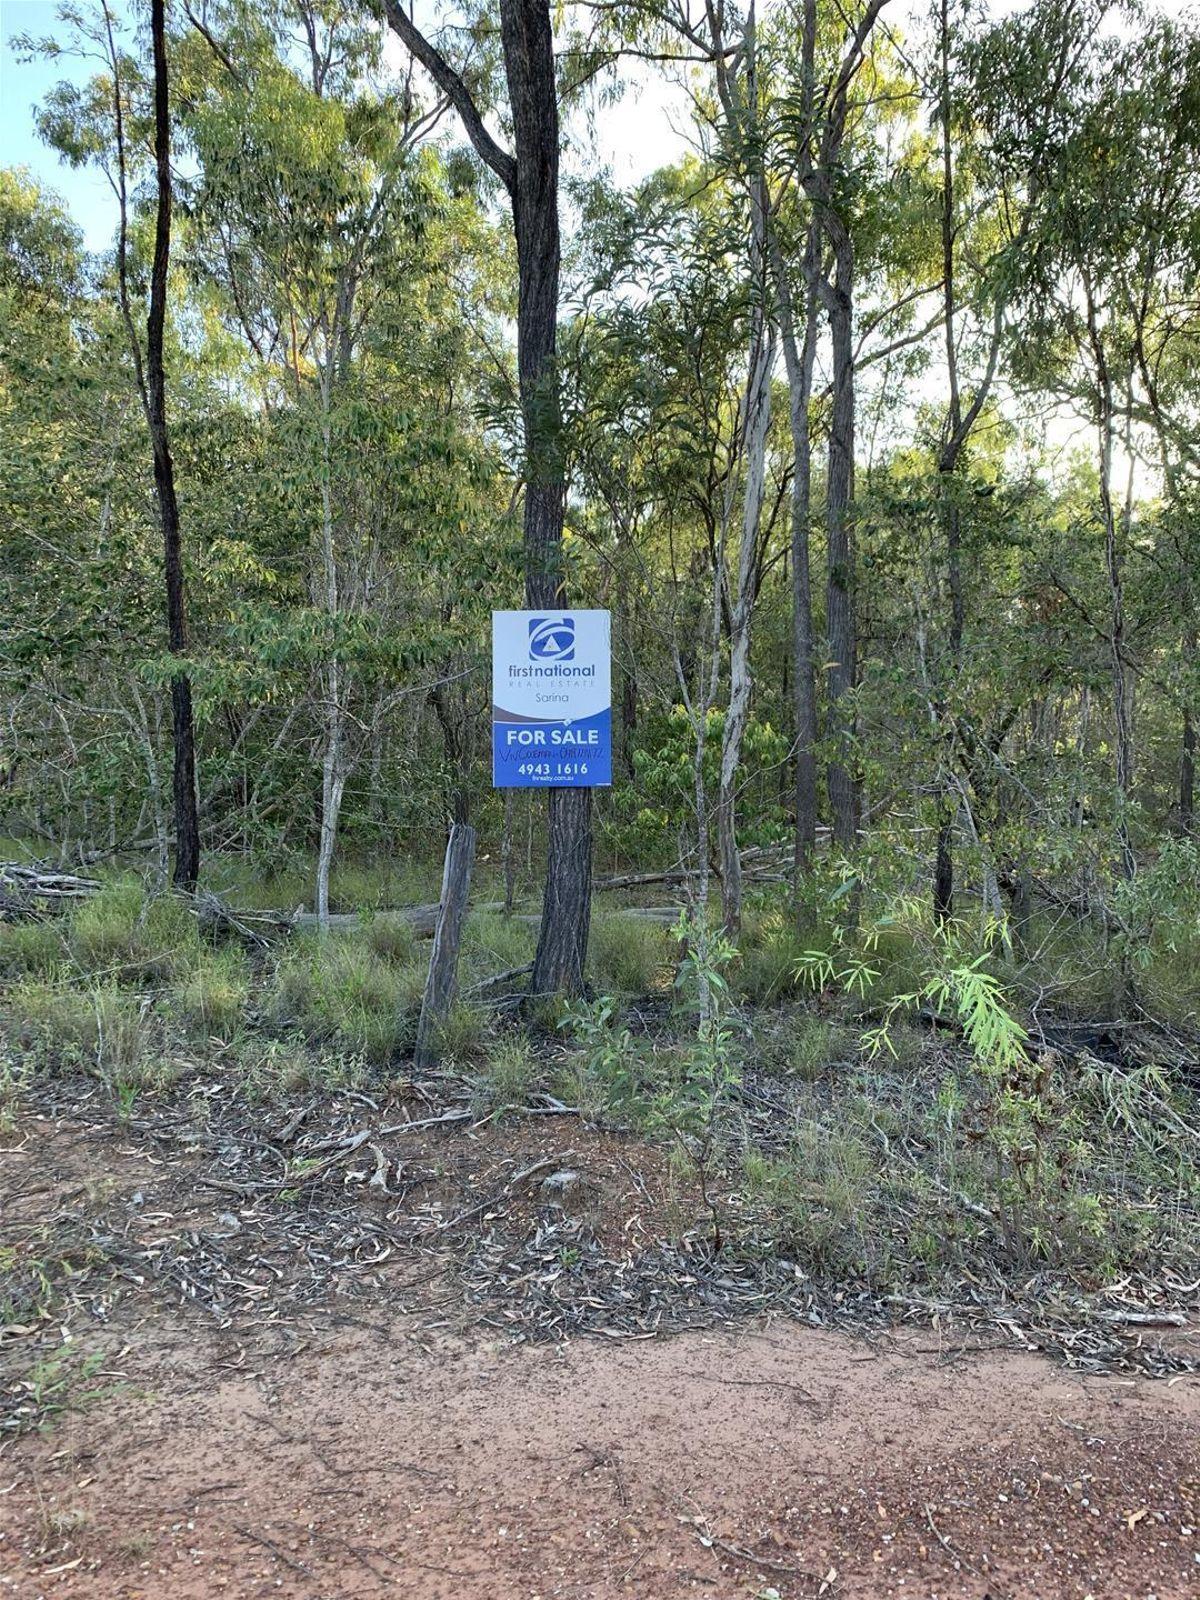 Lot 17 Settlement Road, St Lawrence, QLD 4707